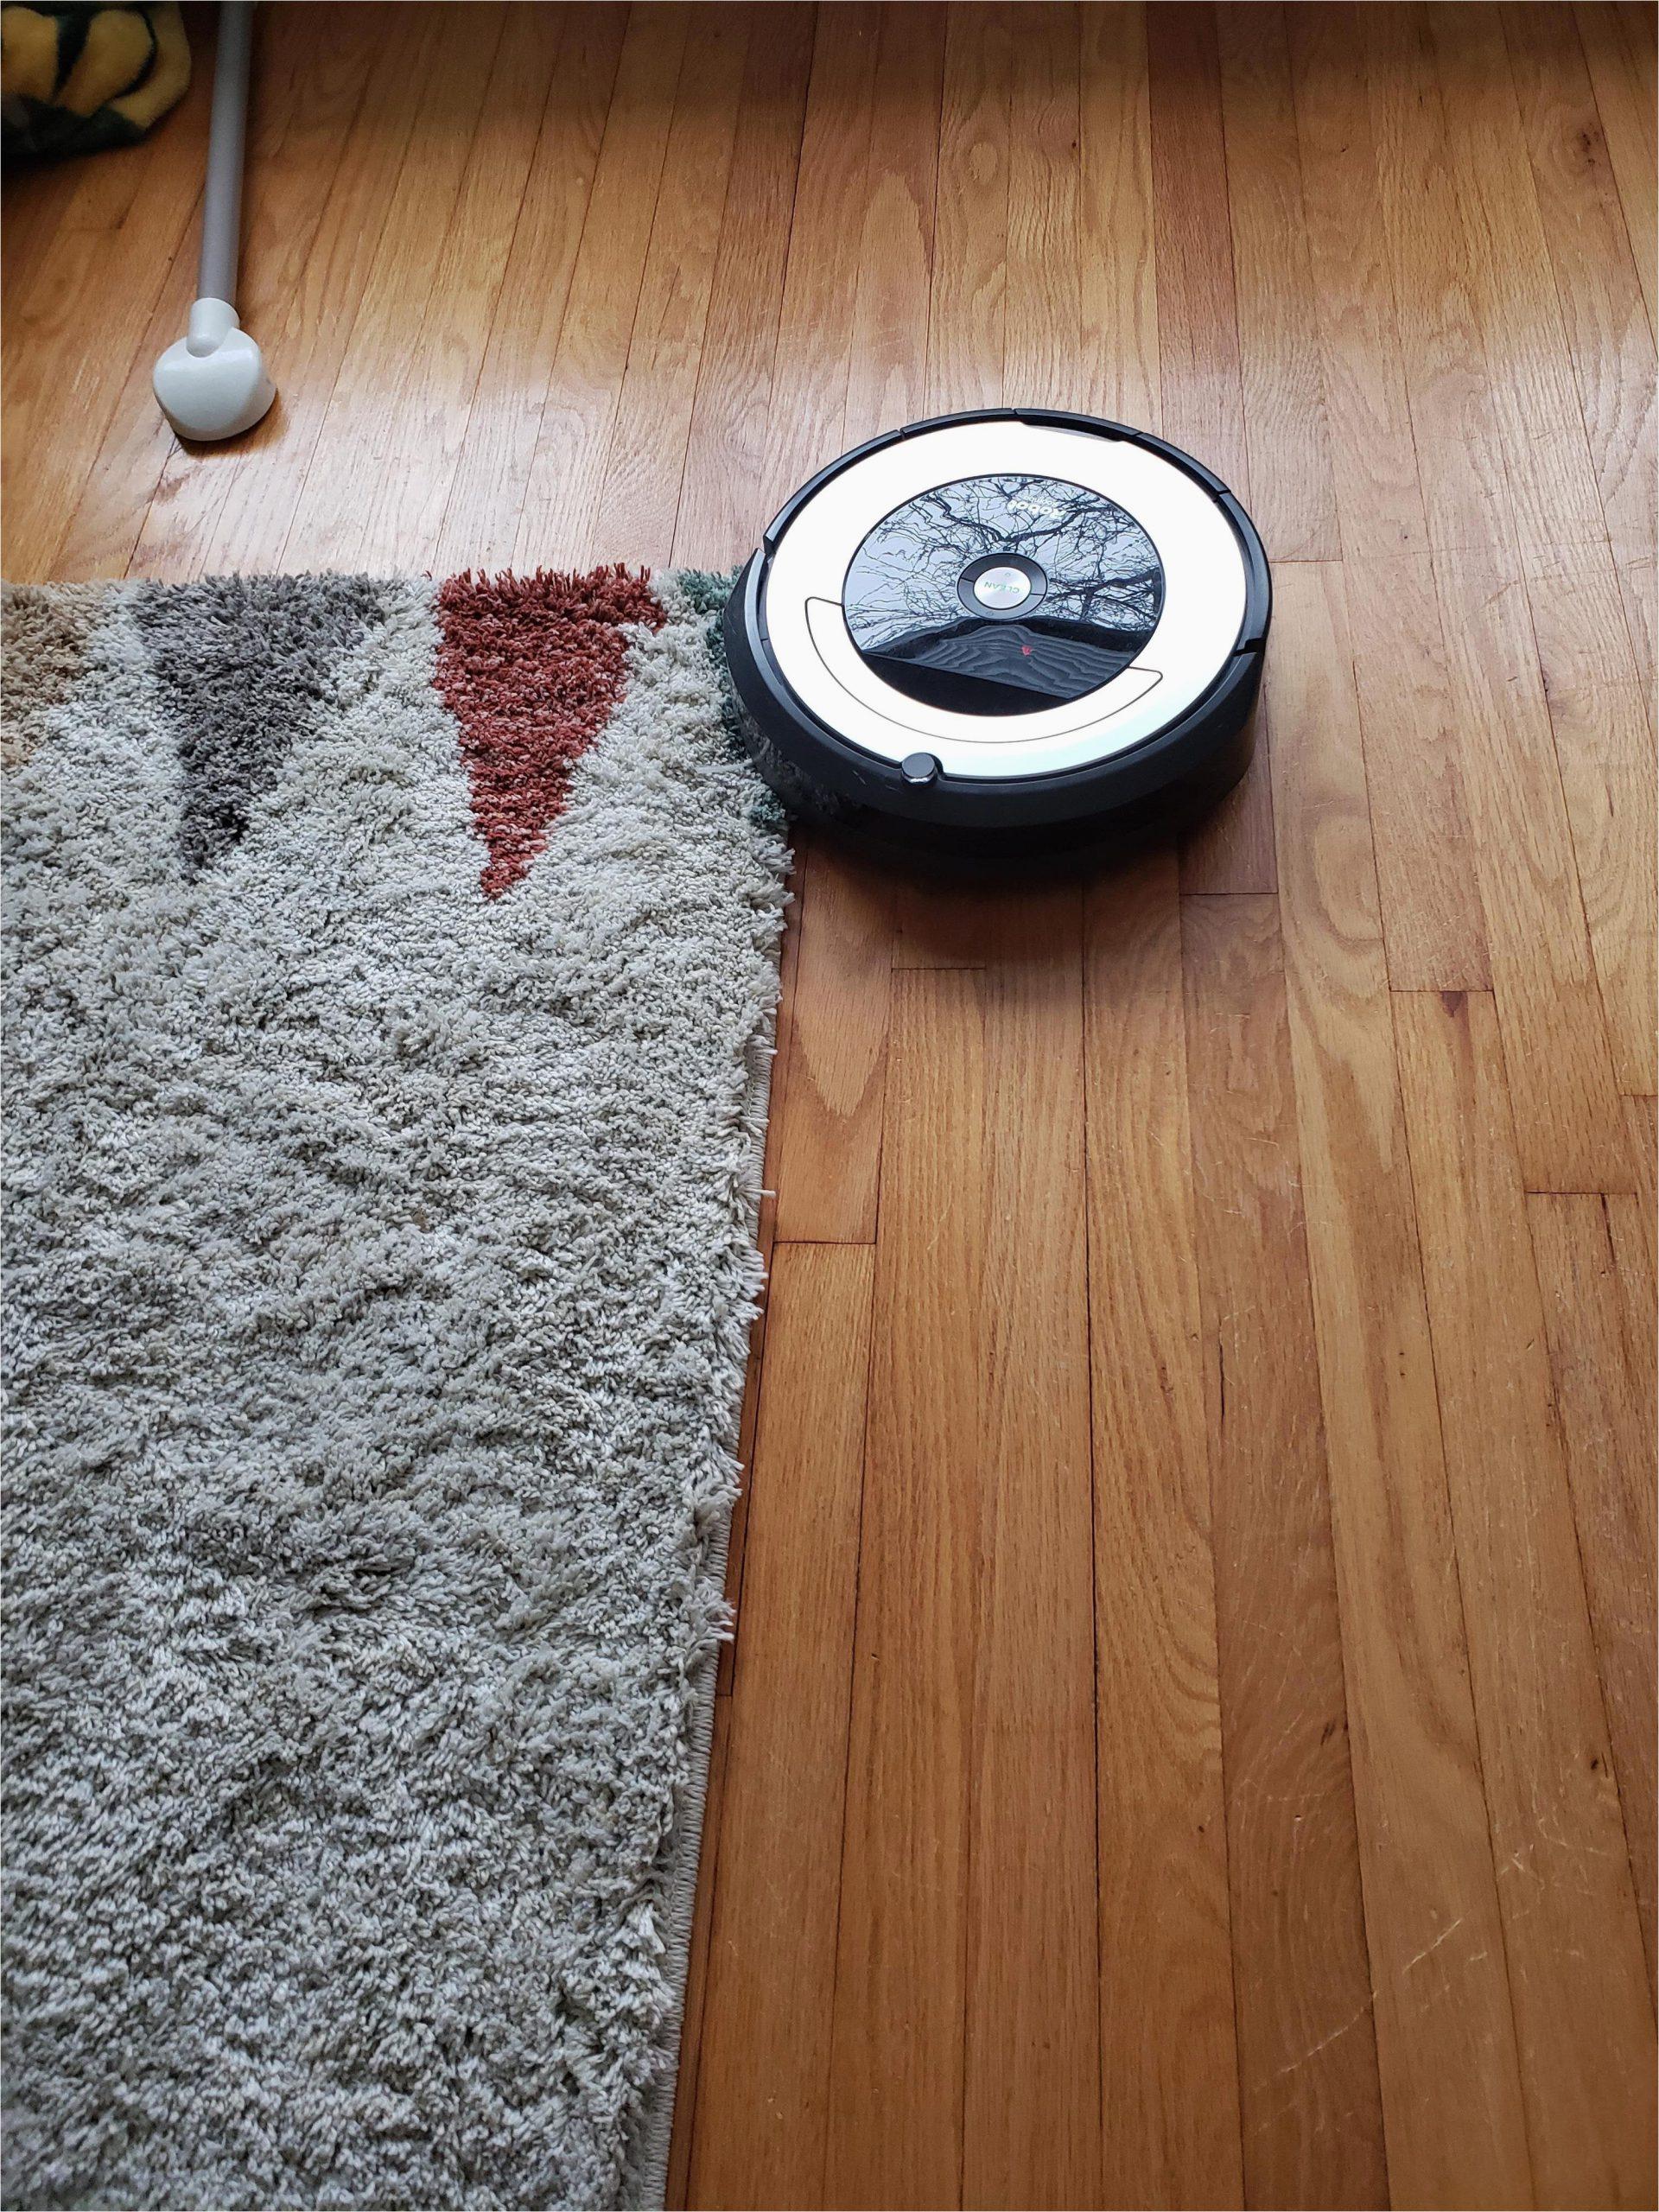 help 690 wont go onto area rug